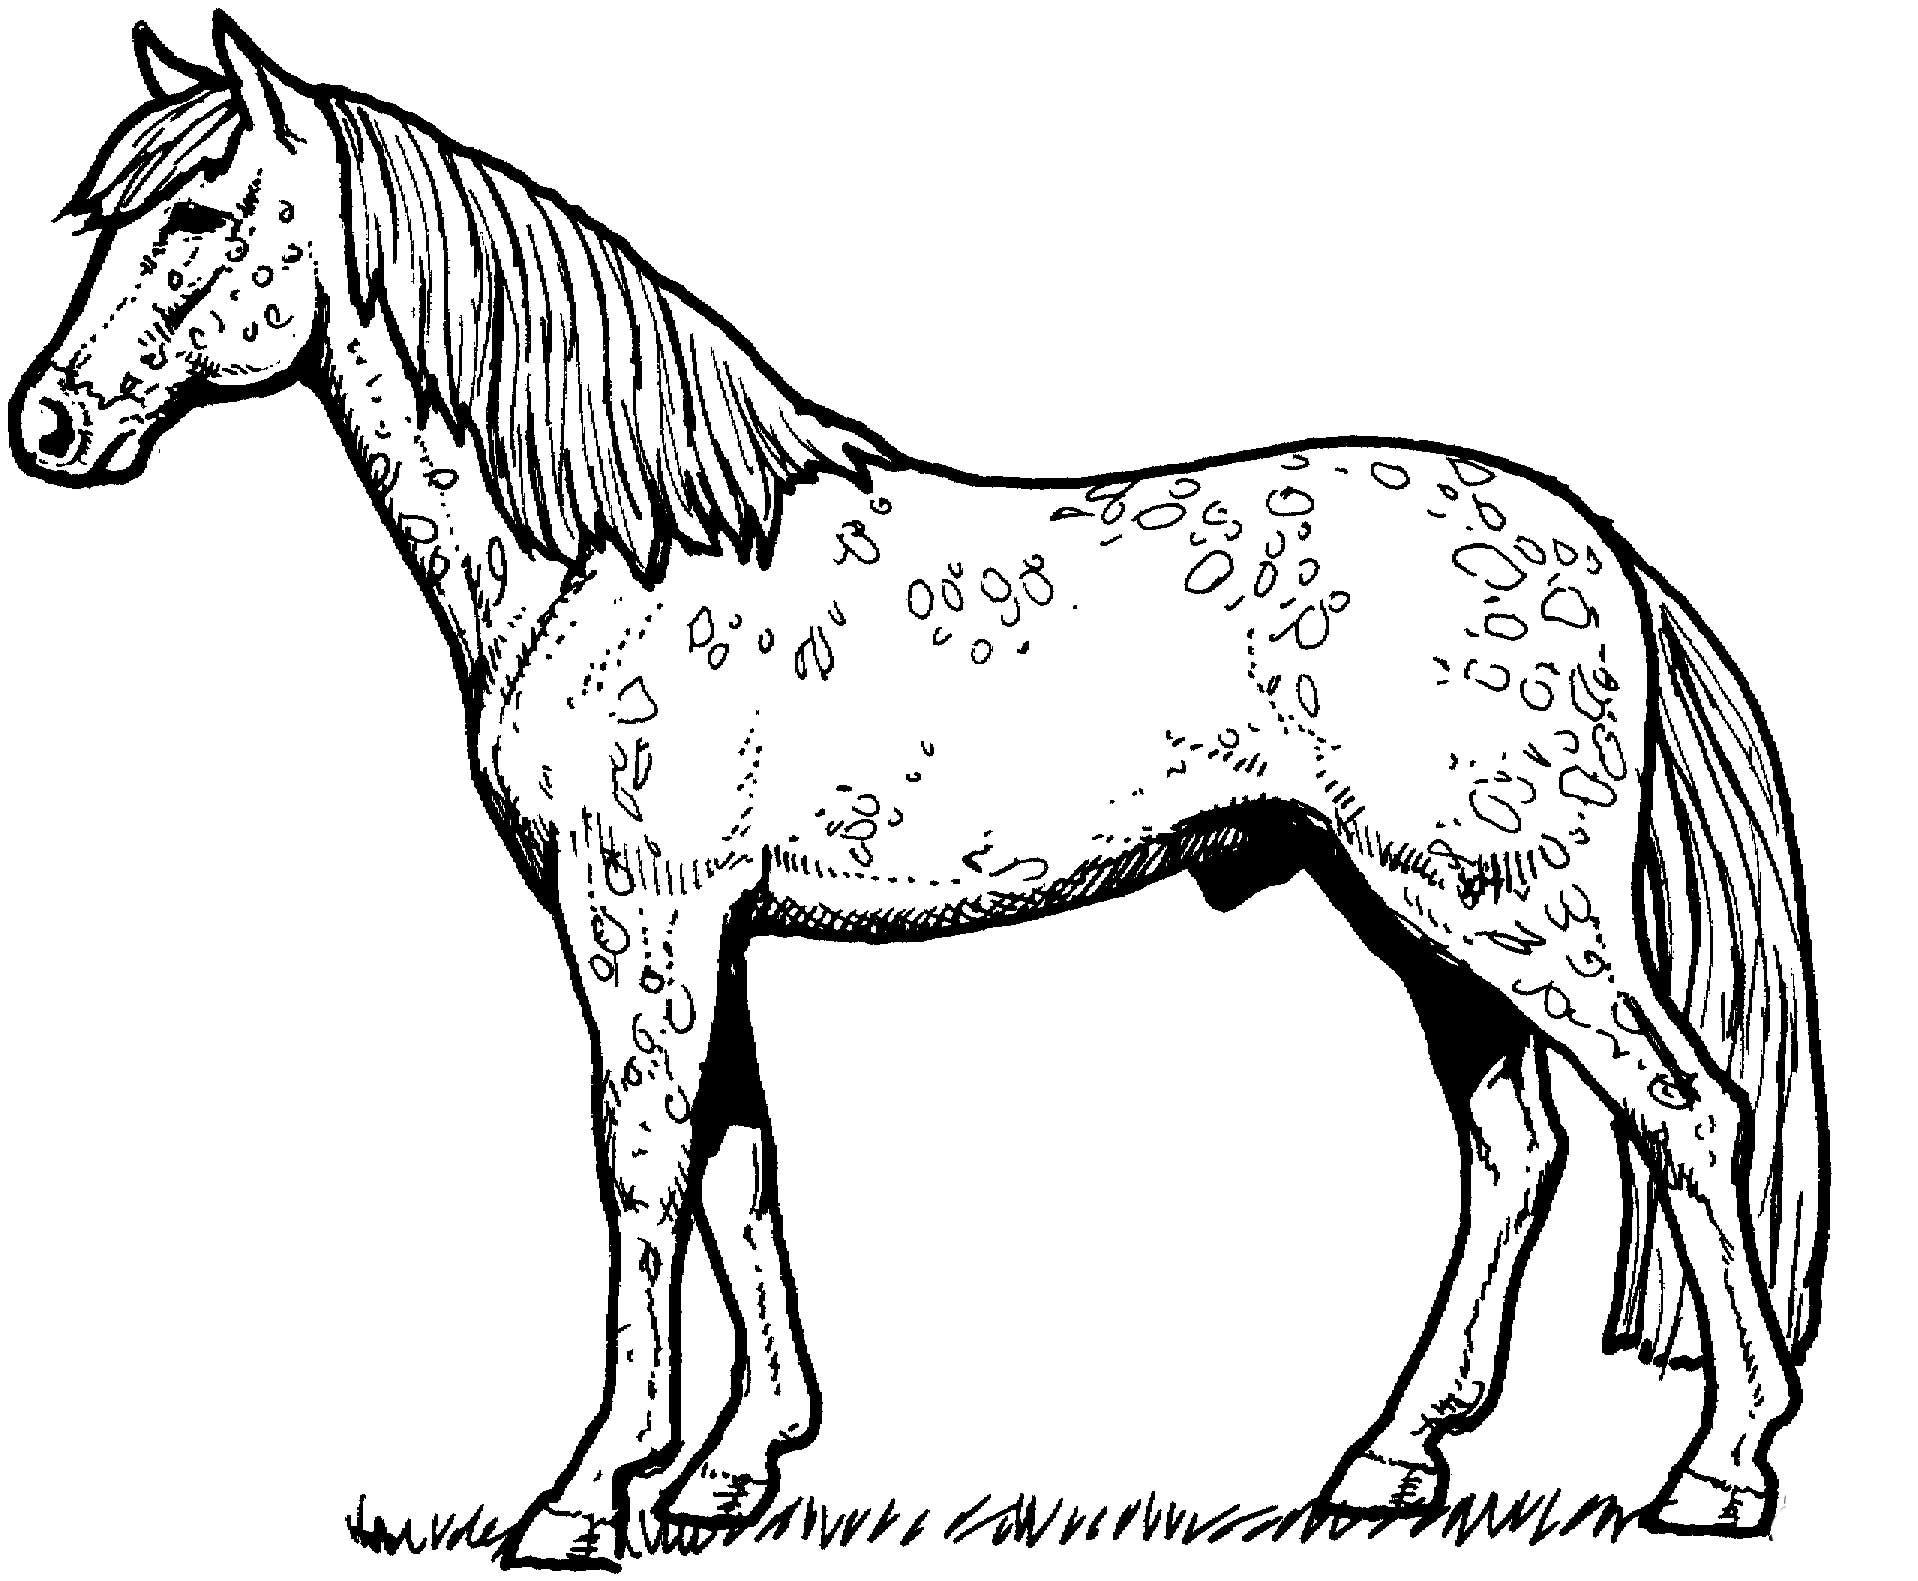 Appaloosa Horse Coloring Page Malvorlagen Pferde Malvorlagen Malvorlagen Tiere [ 1581 x 1918 Pixel ]